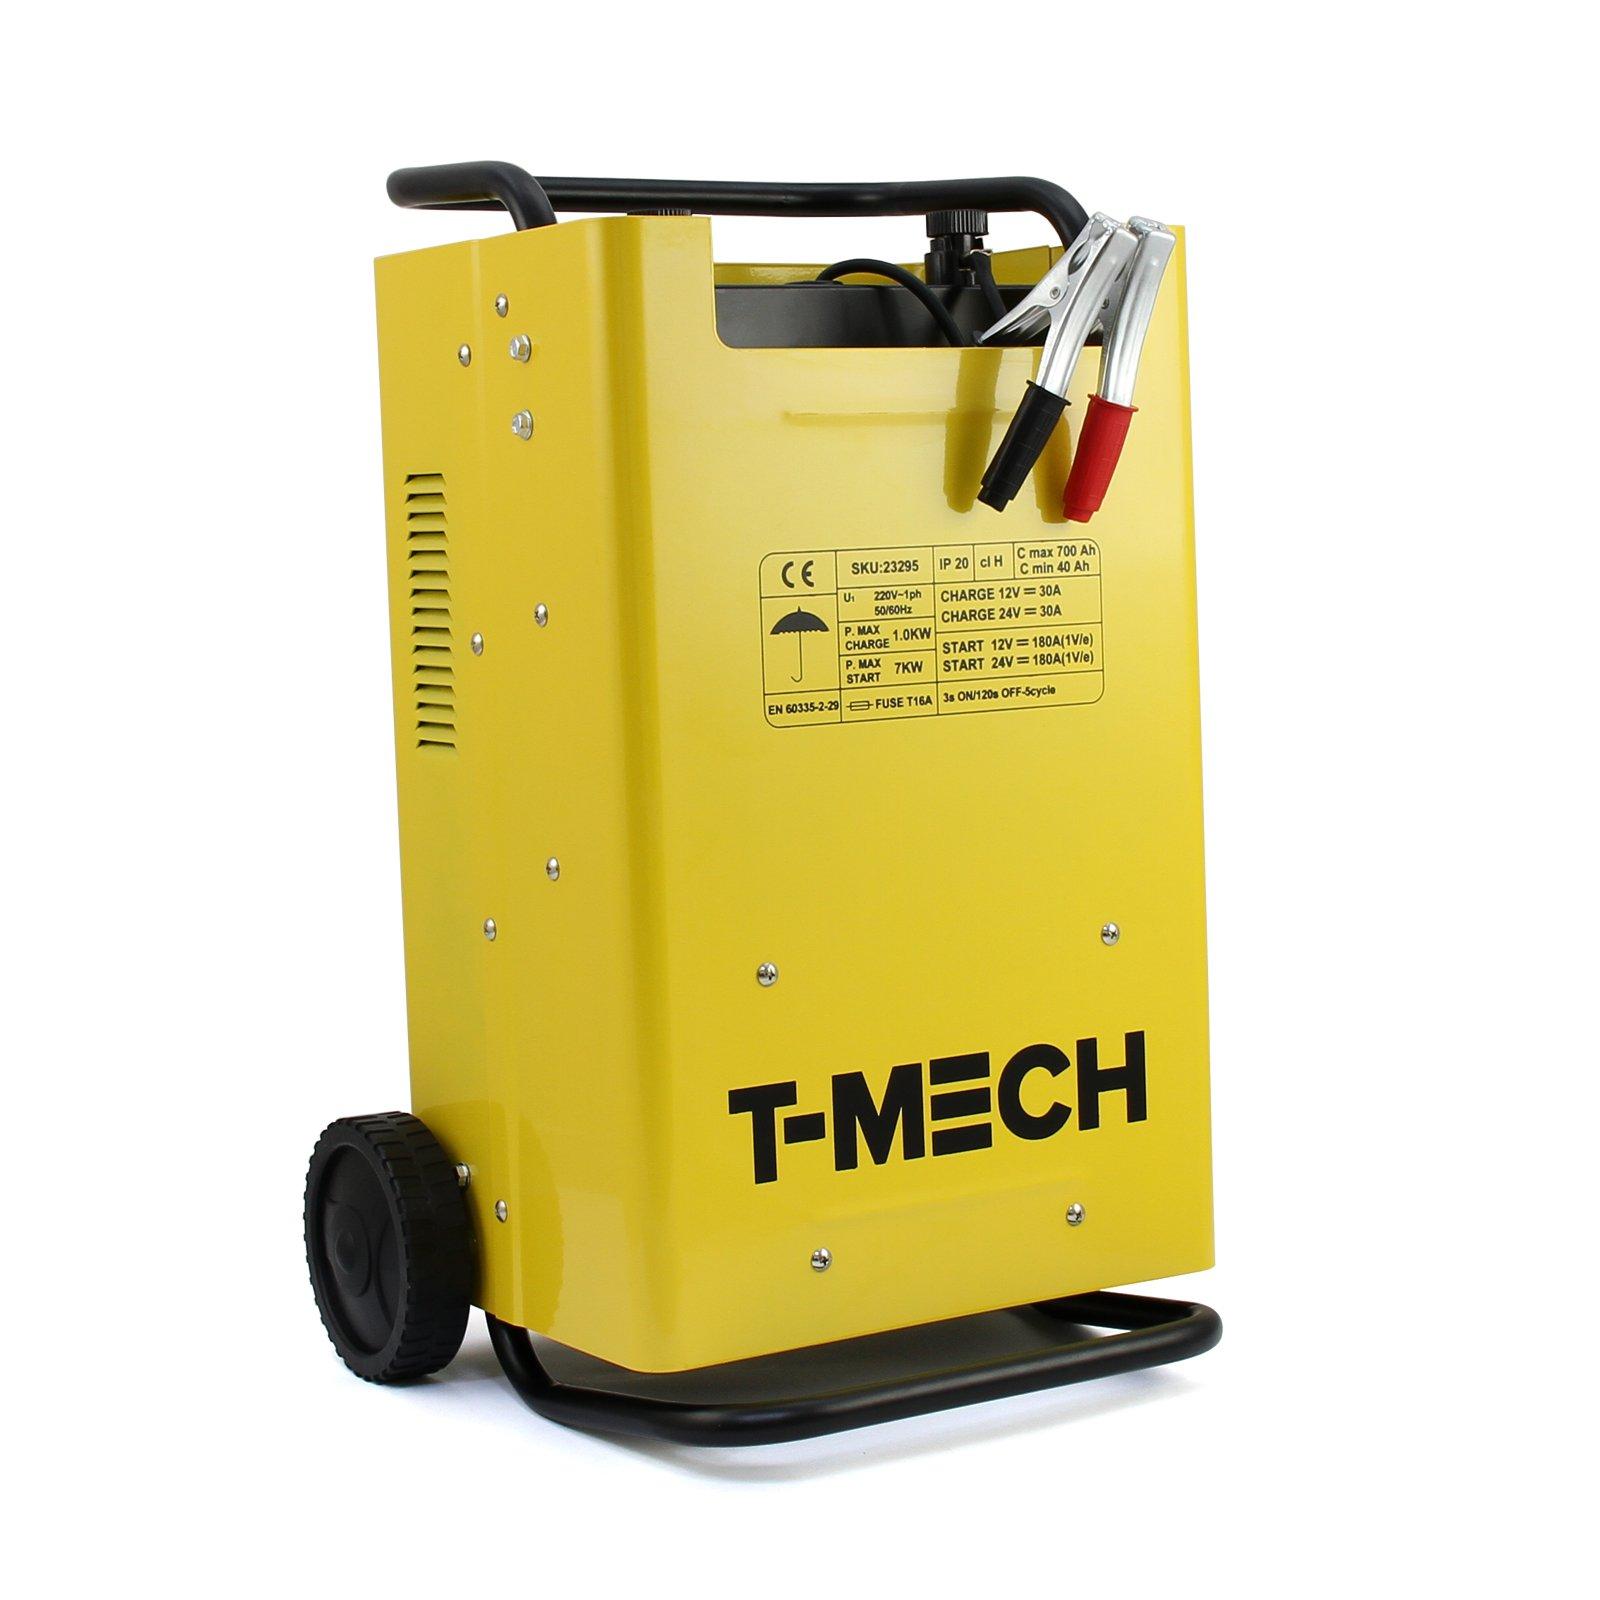 T-Mech Car Jump Starter & Battery Charger Power Pack Portable Batteries Start Power Booster for Vehicles Vans Motorbikes 12/24 Volts